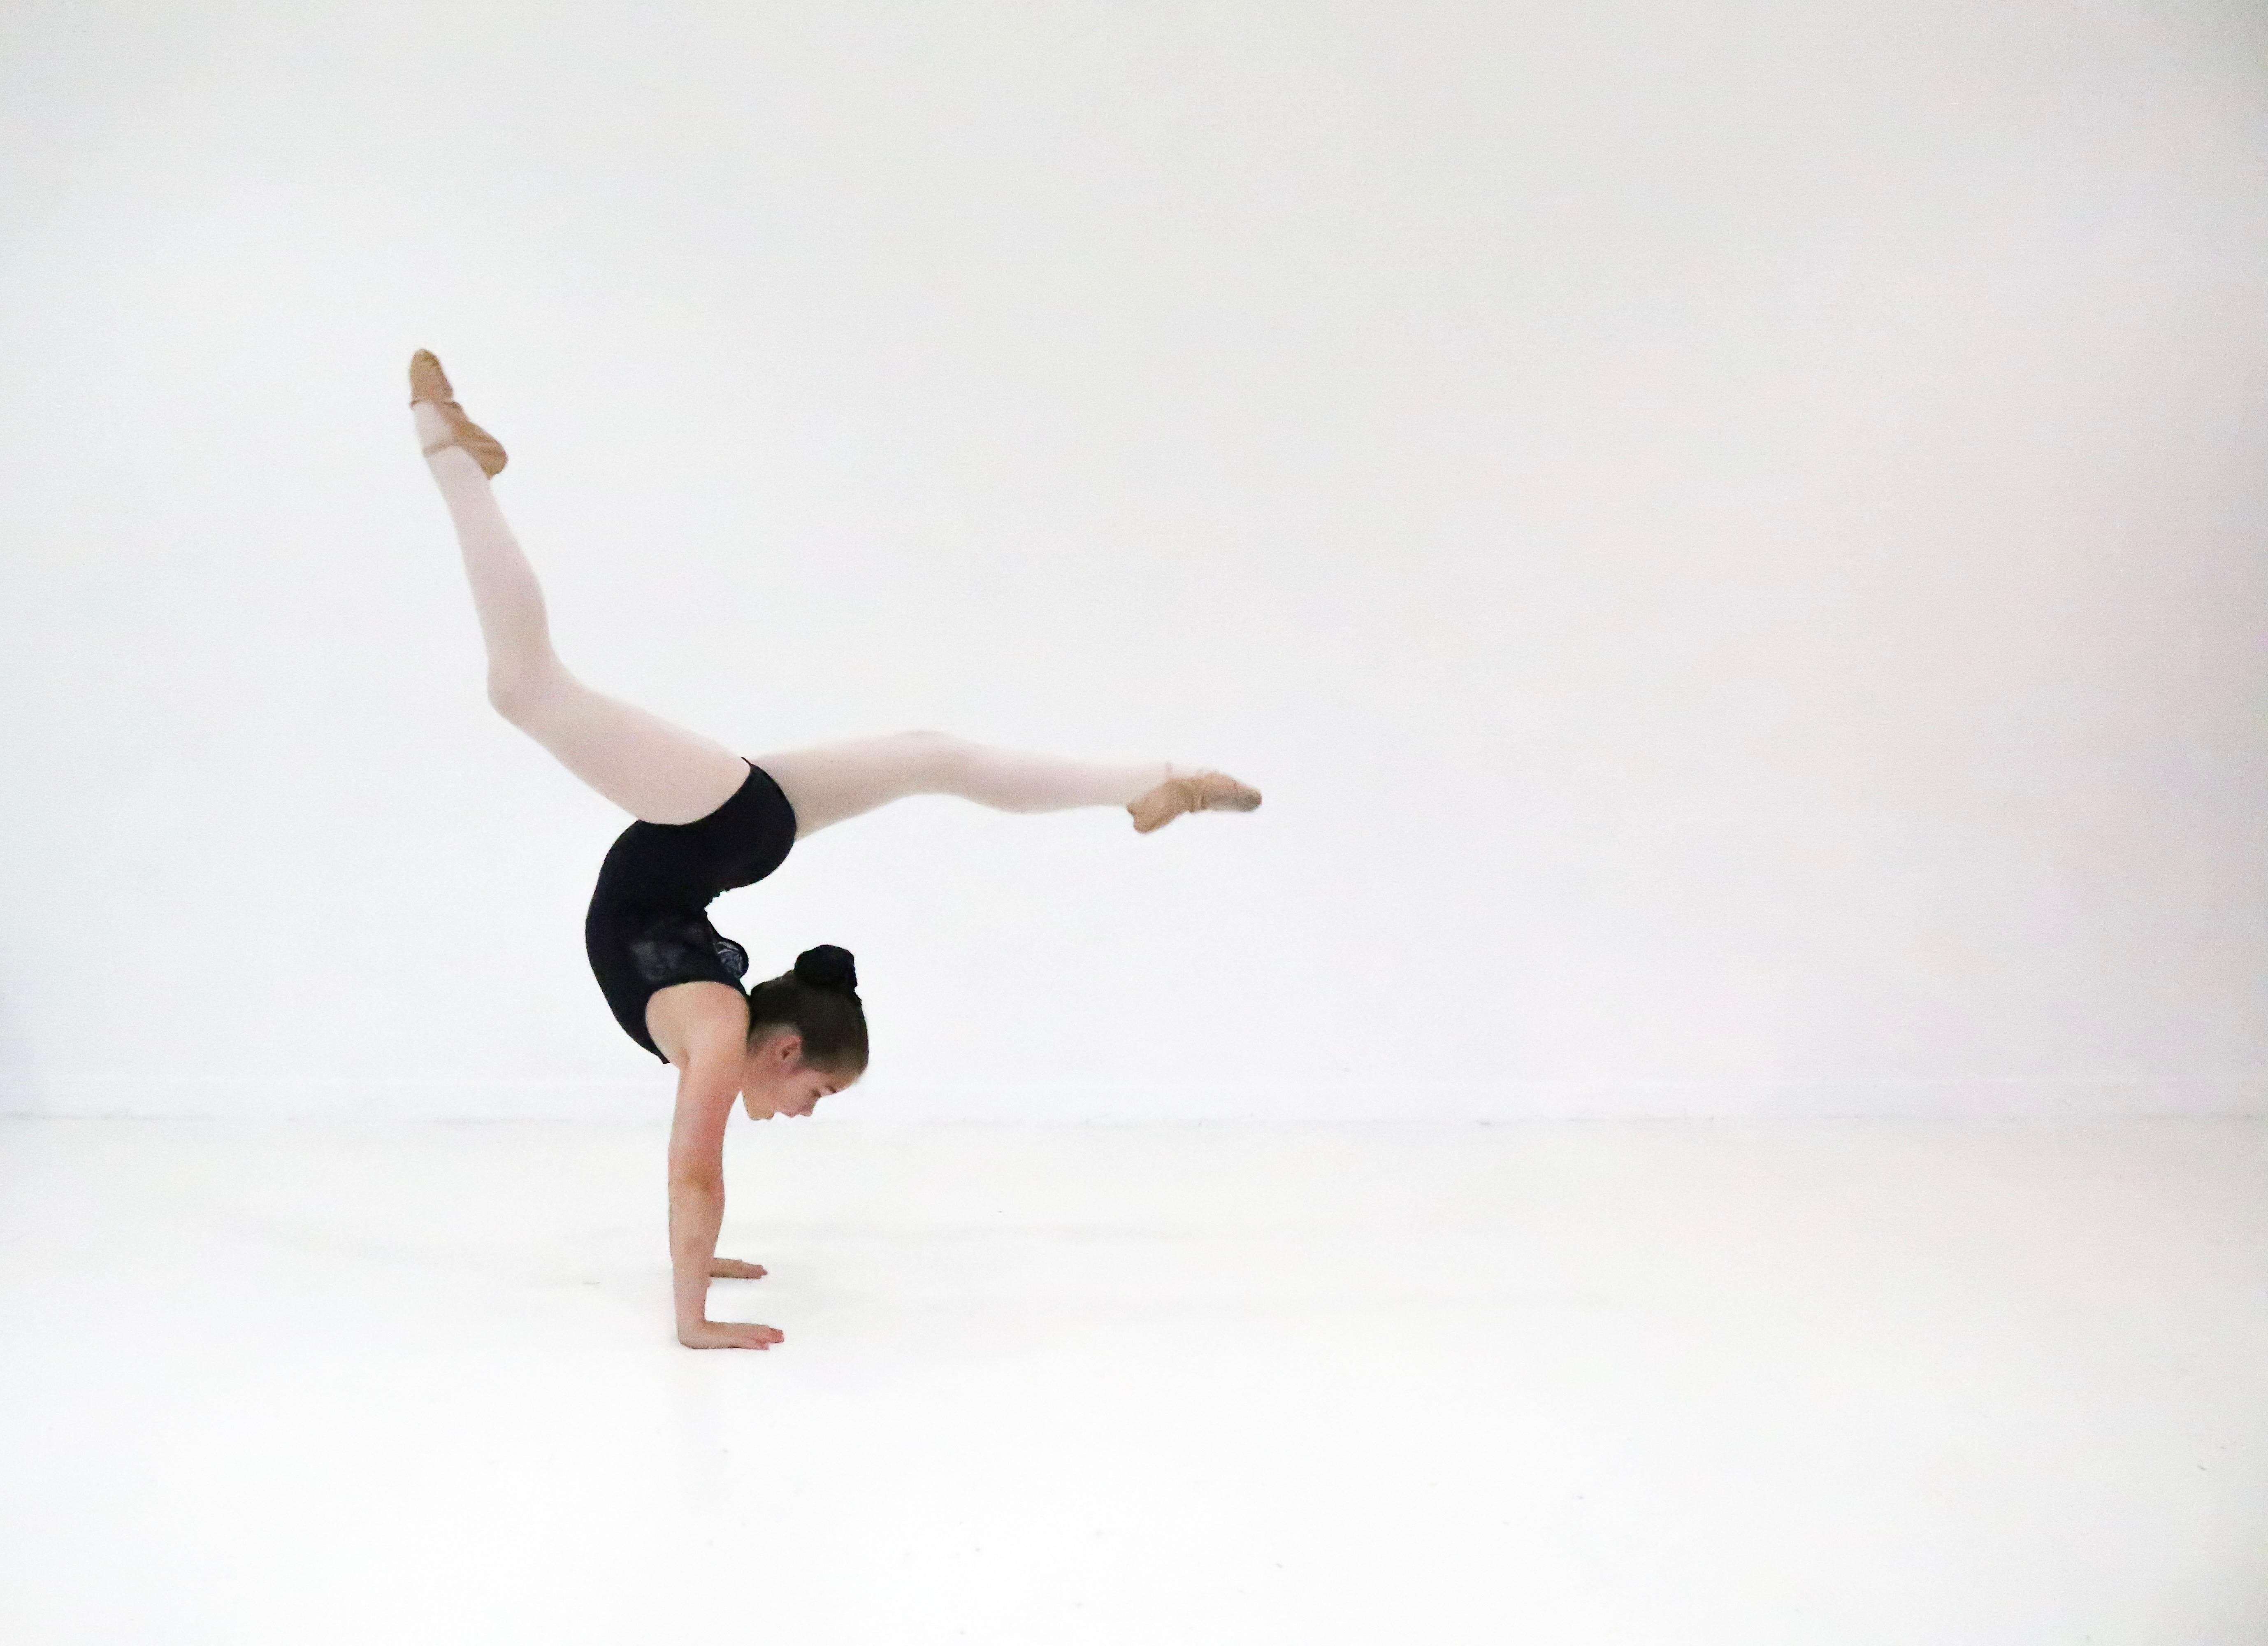 11-12 year old Summer Dance Camp